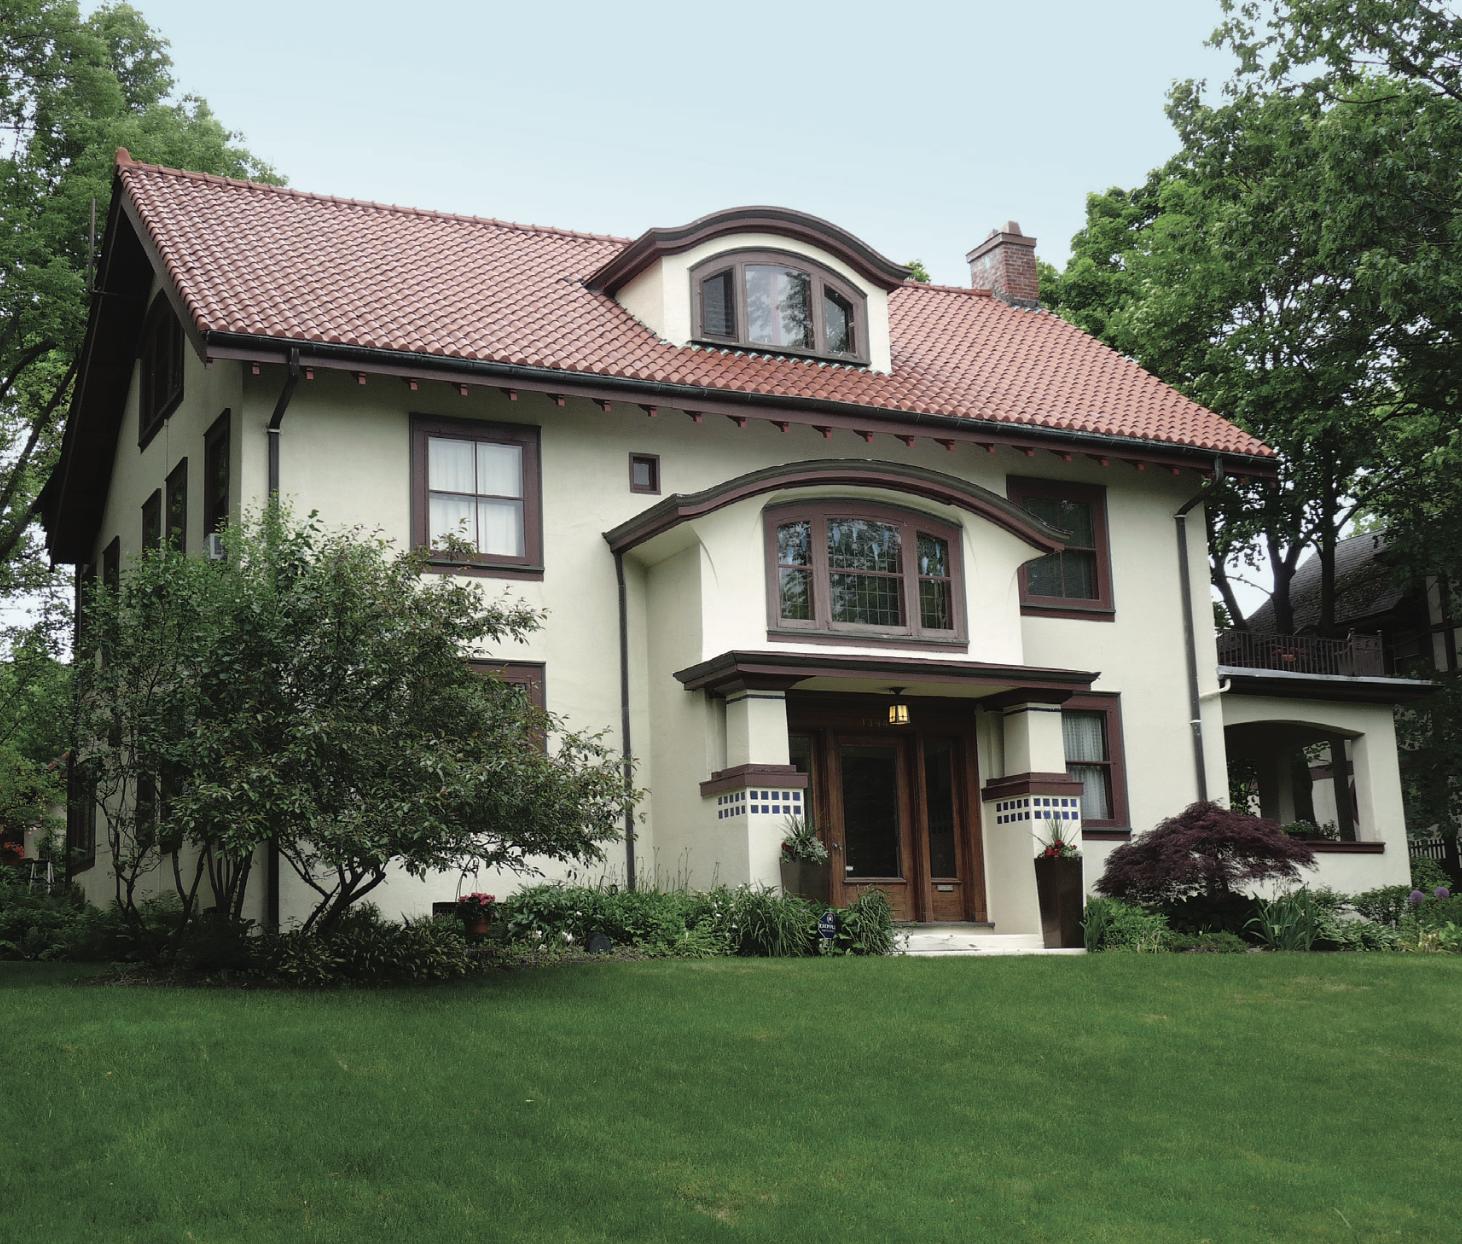 Repairing Stucco Old House Journal Magazine